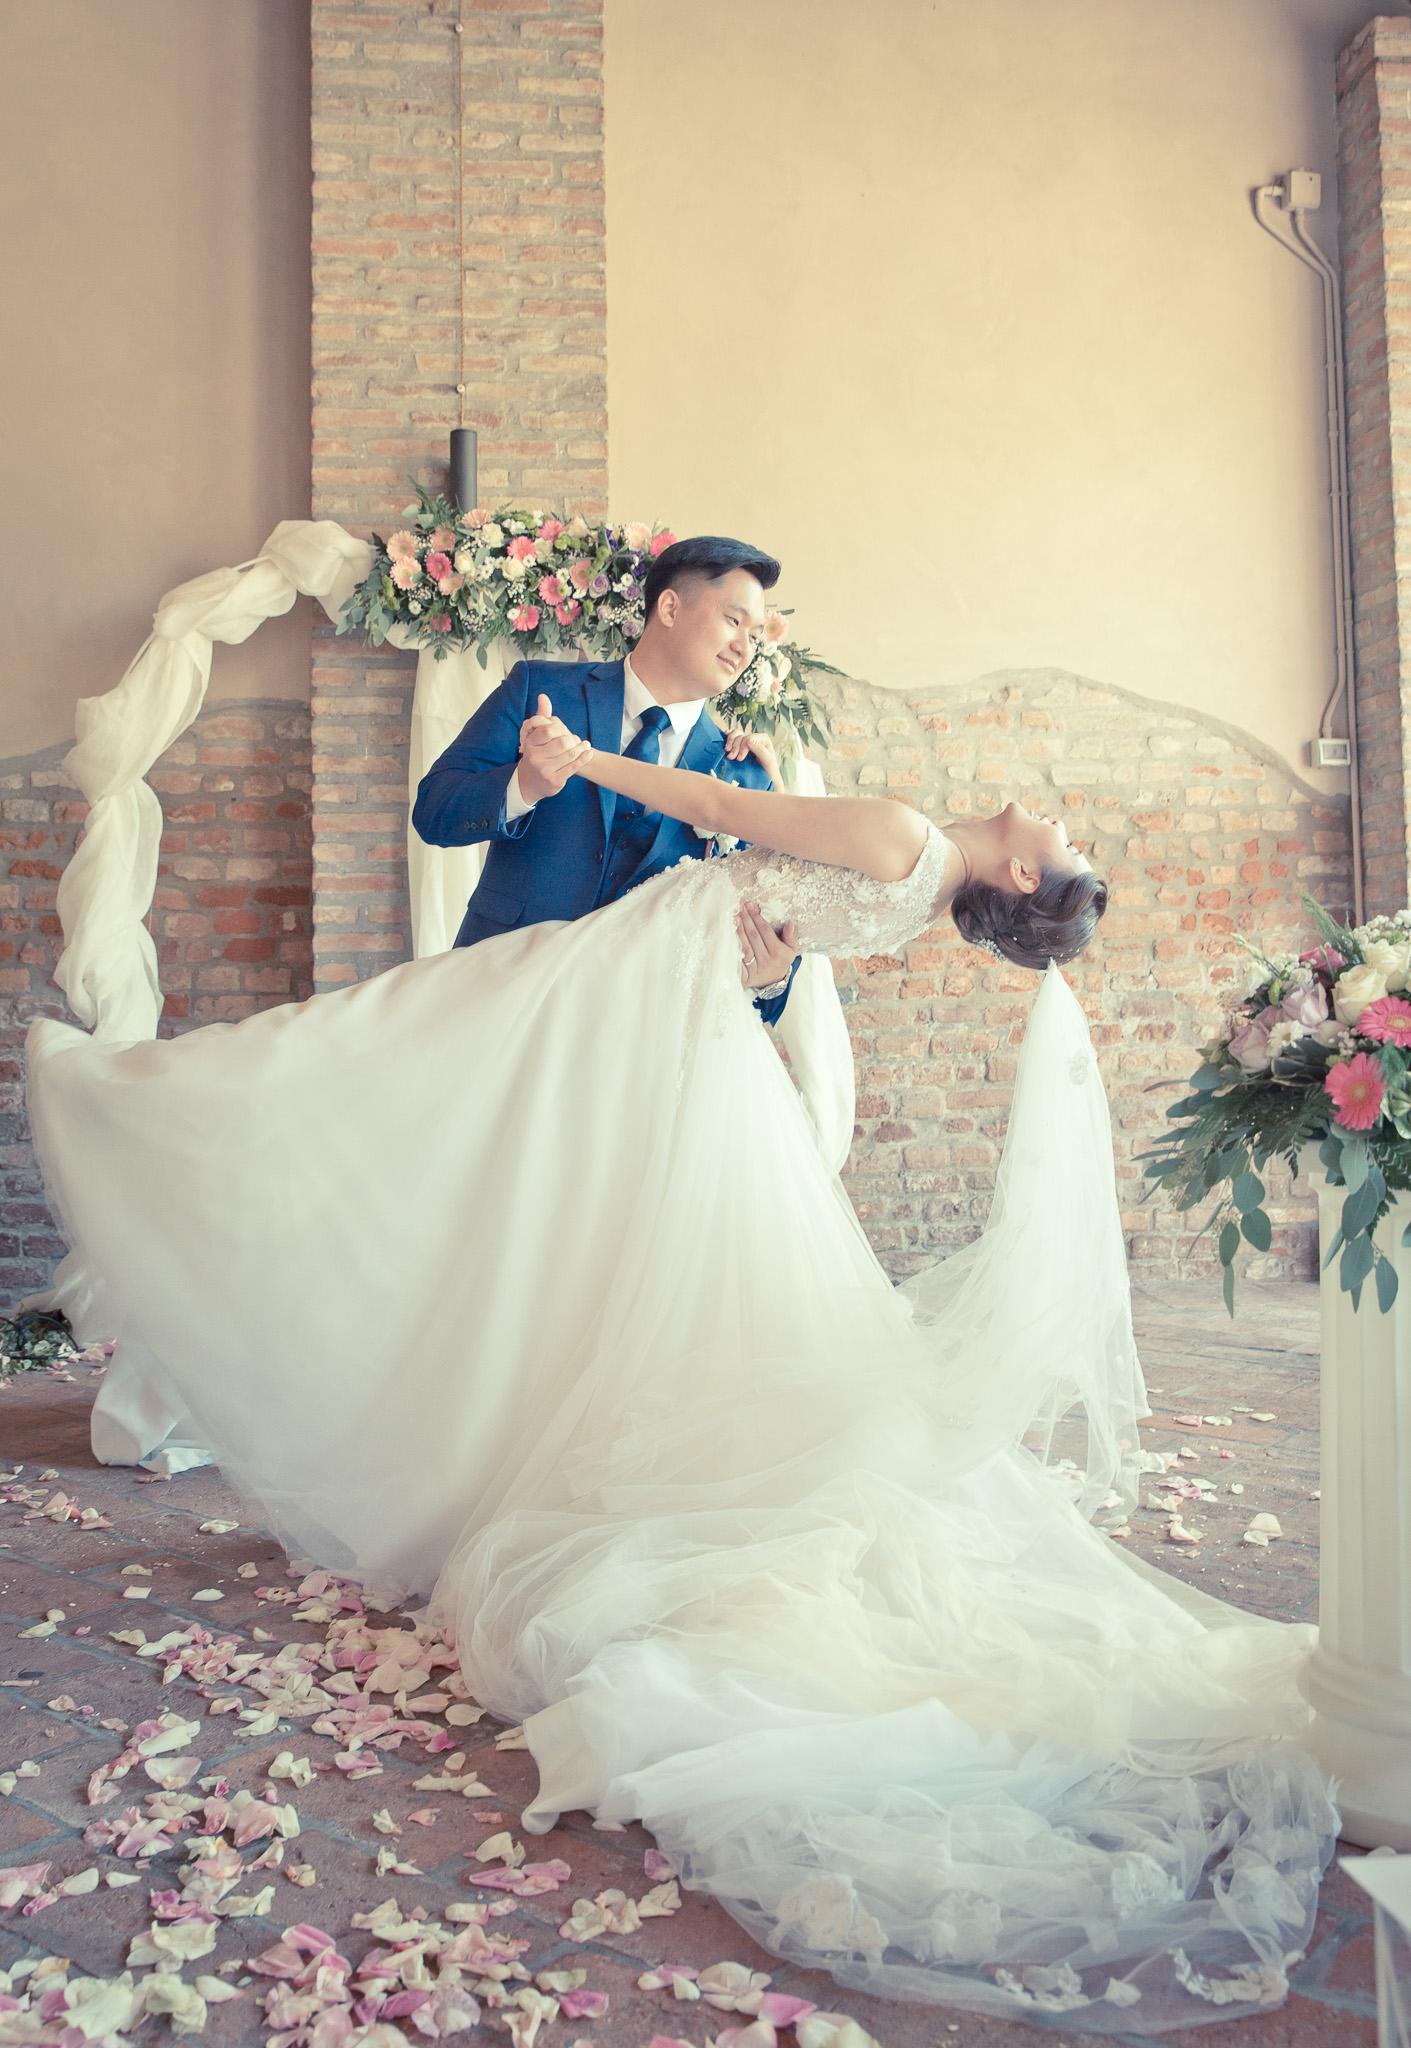 466eff3659ec Matrimonio civile Brescia location